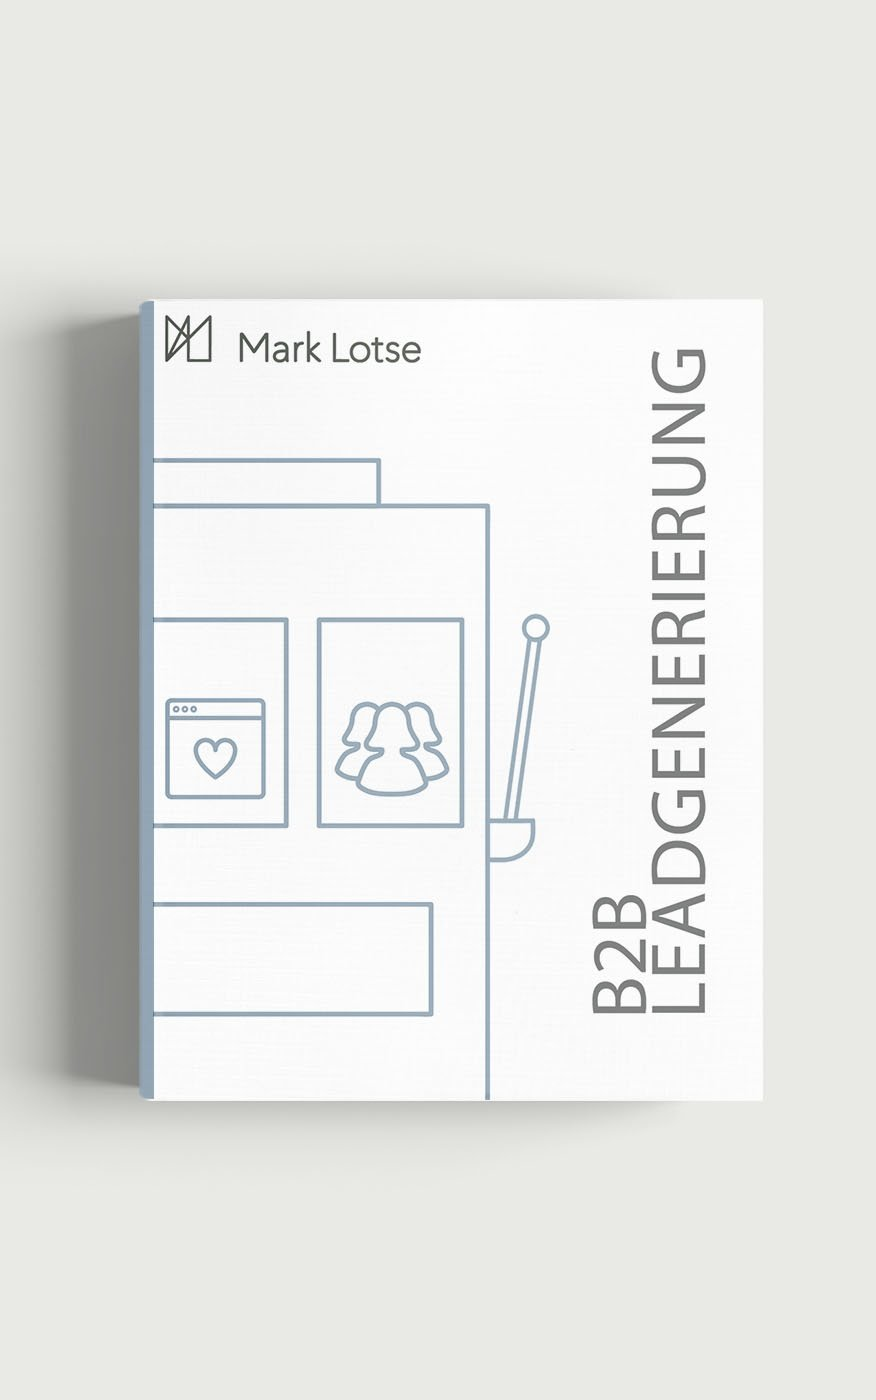 b2b Leadgenerierung mit Mark Lotse eBook